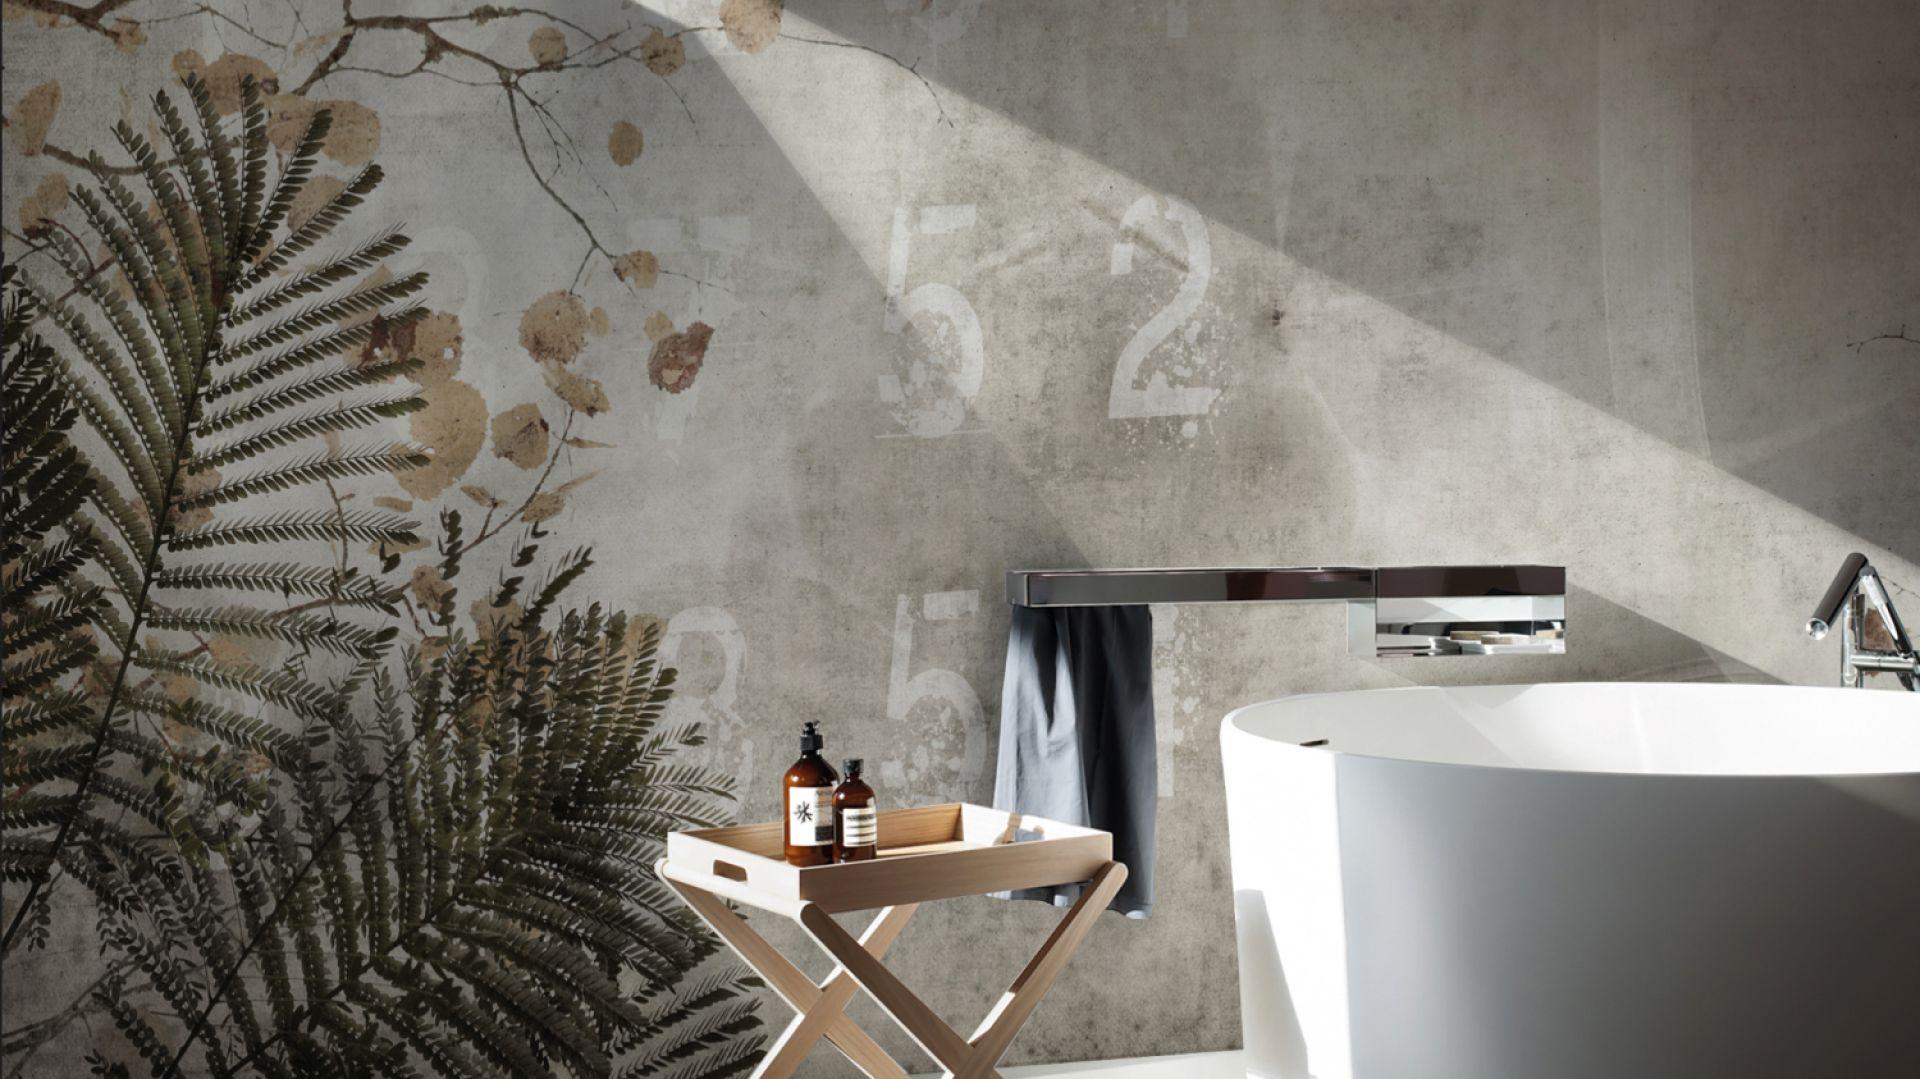 Wodoodporna tapeta Concrete Acacia z kolekcji David Selection. Fot. N.O.W. Edizioni